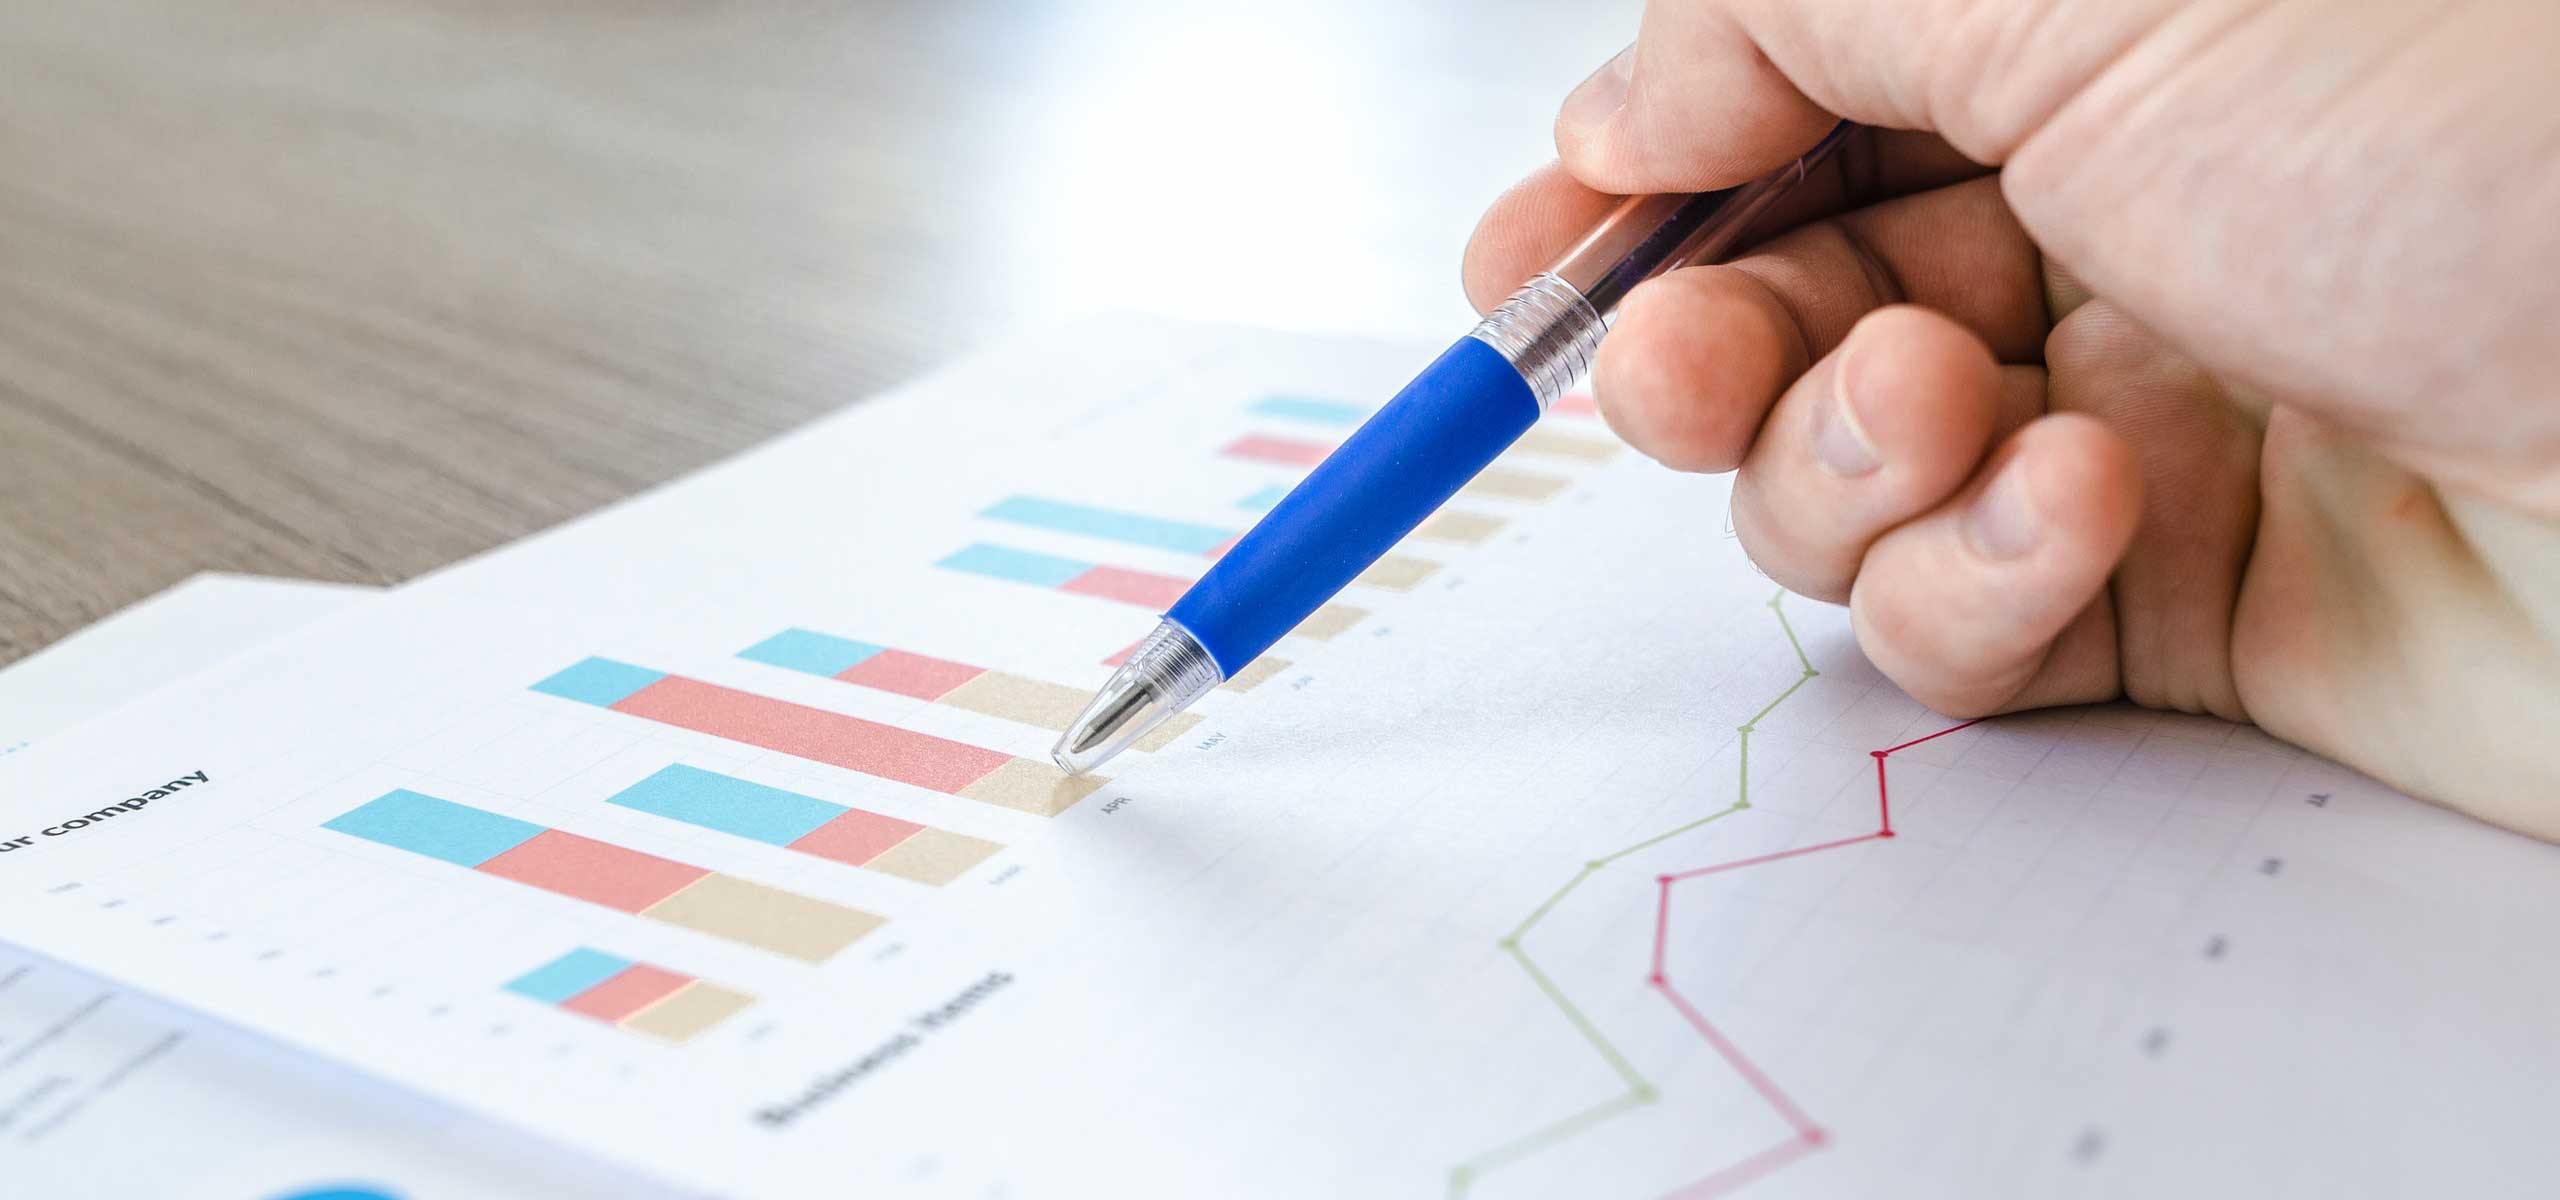 Cursuri de Excel incepator urmarire grafice